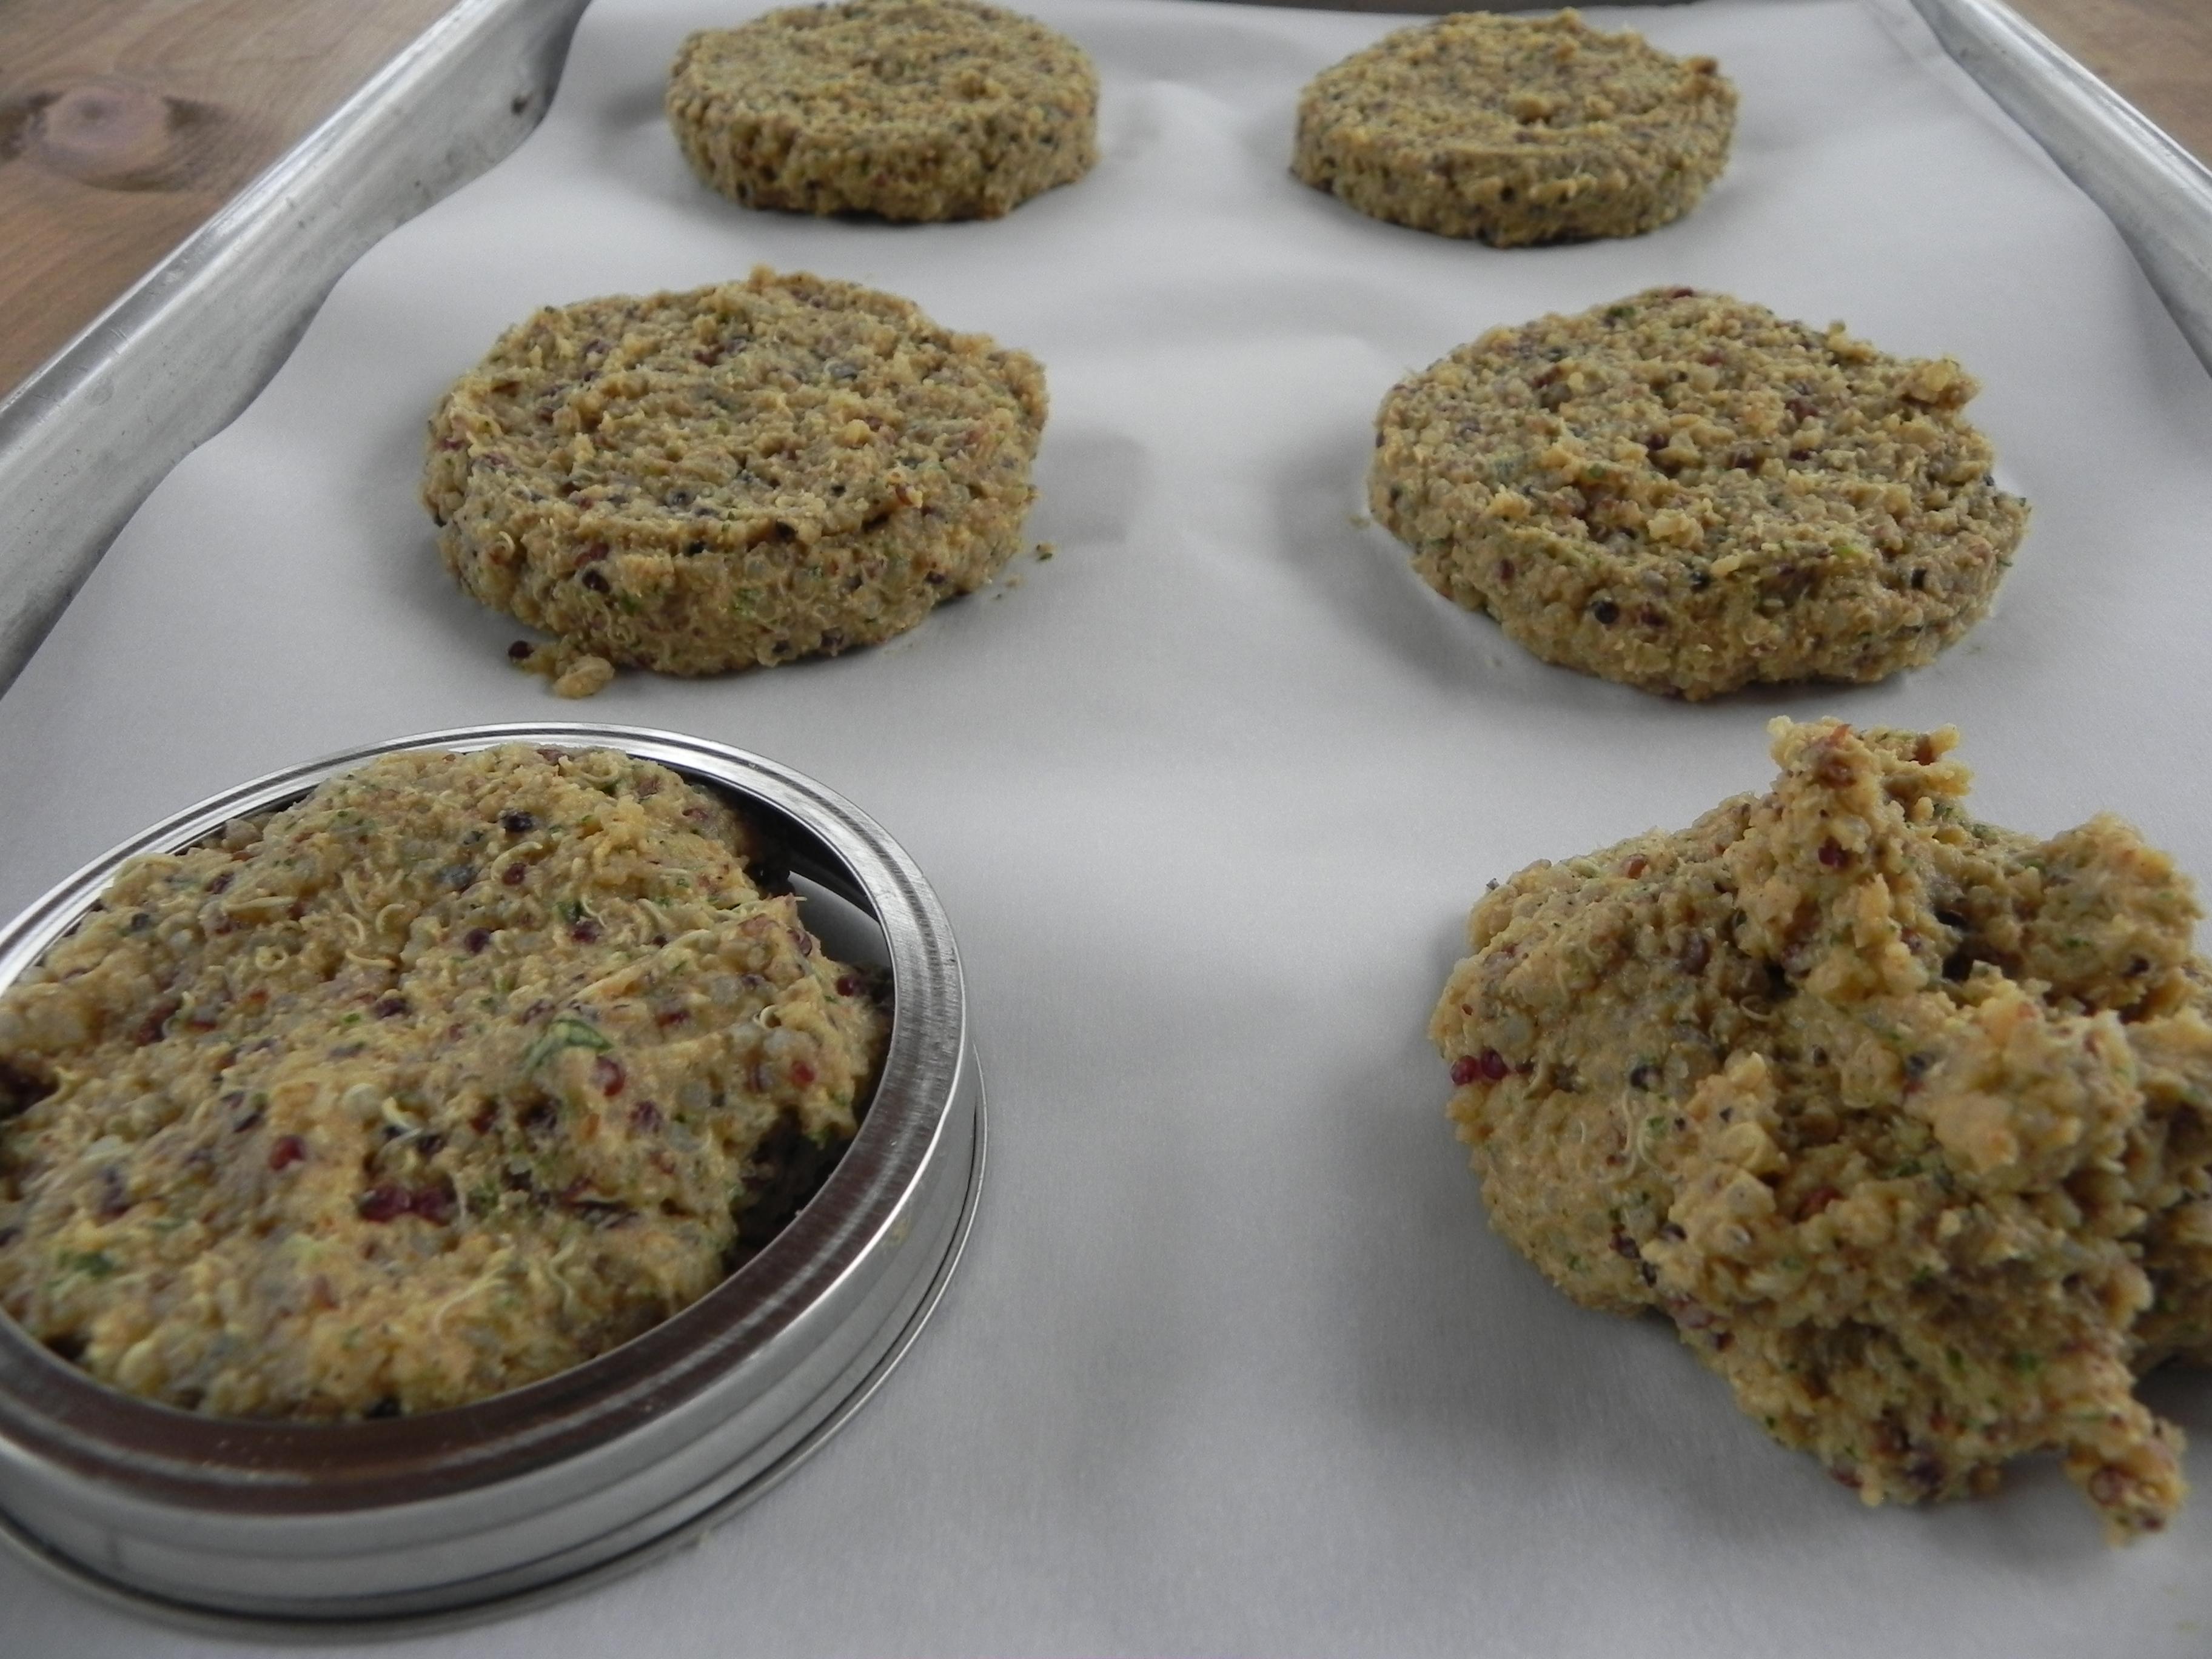 Using A Food Processor,bine The Garbanzo Beans, 2 Cups Quinoa, Egg,  Flour, Cilantro, Tahini, Soy Sauce, Thyme, Cumin, Paprika, Garlic Powder,  Coriander,